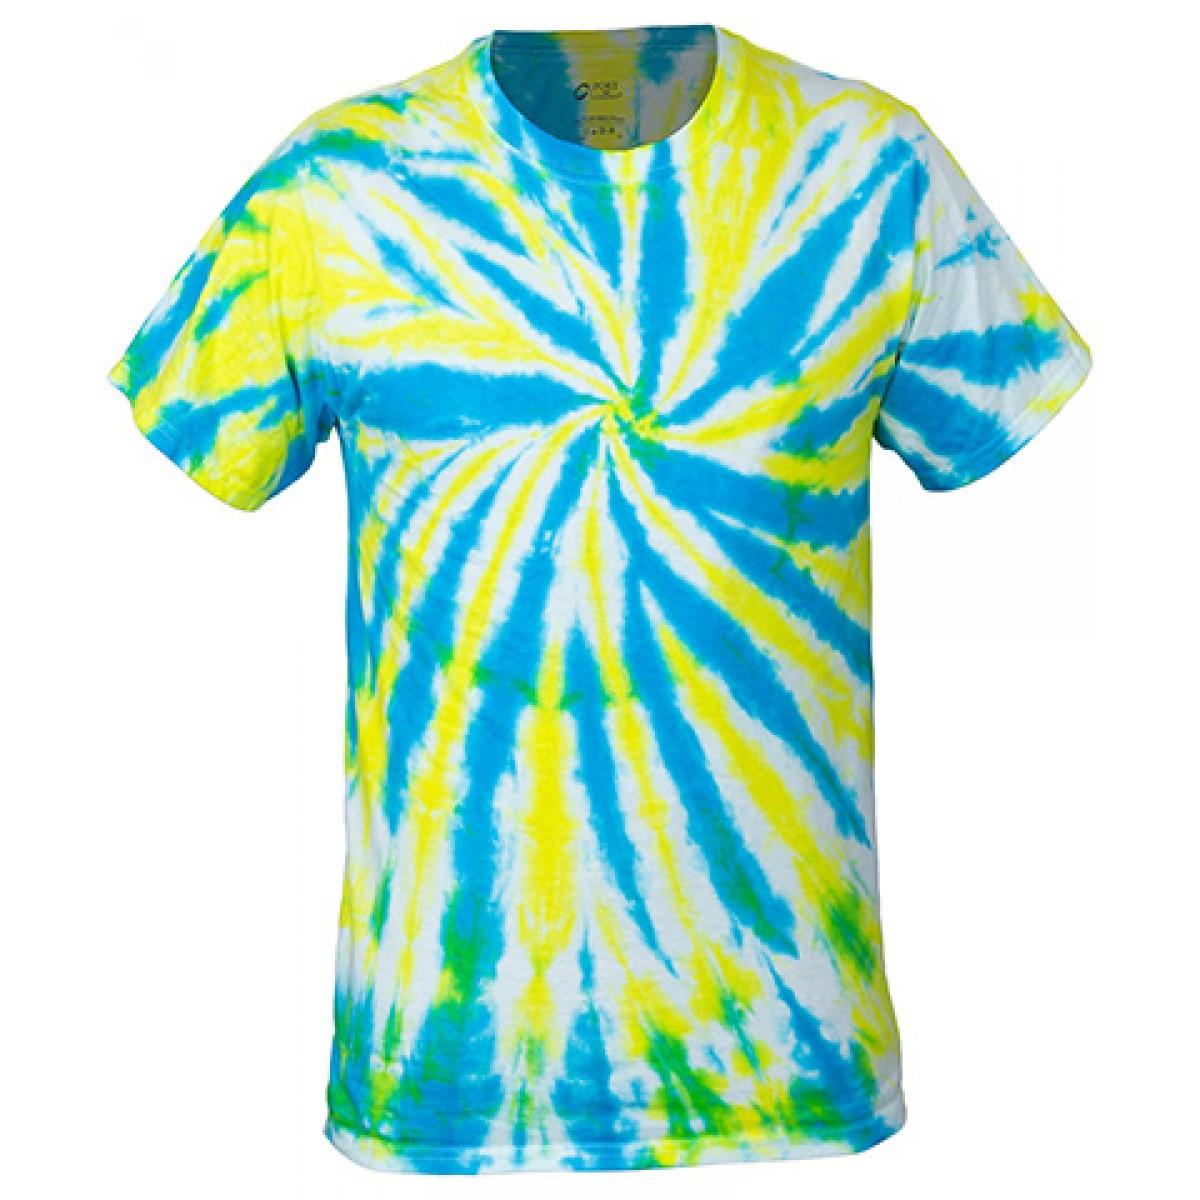 Multi-Color Tie-Dye Tee -Blue-YL